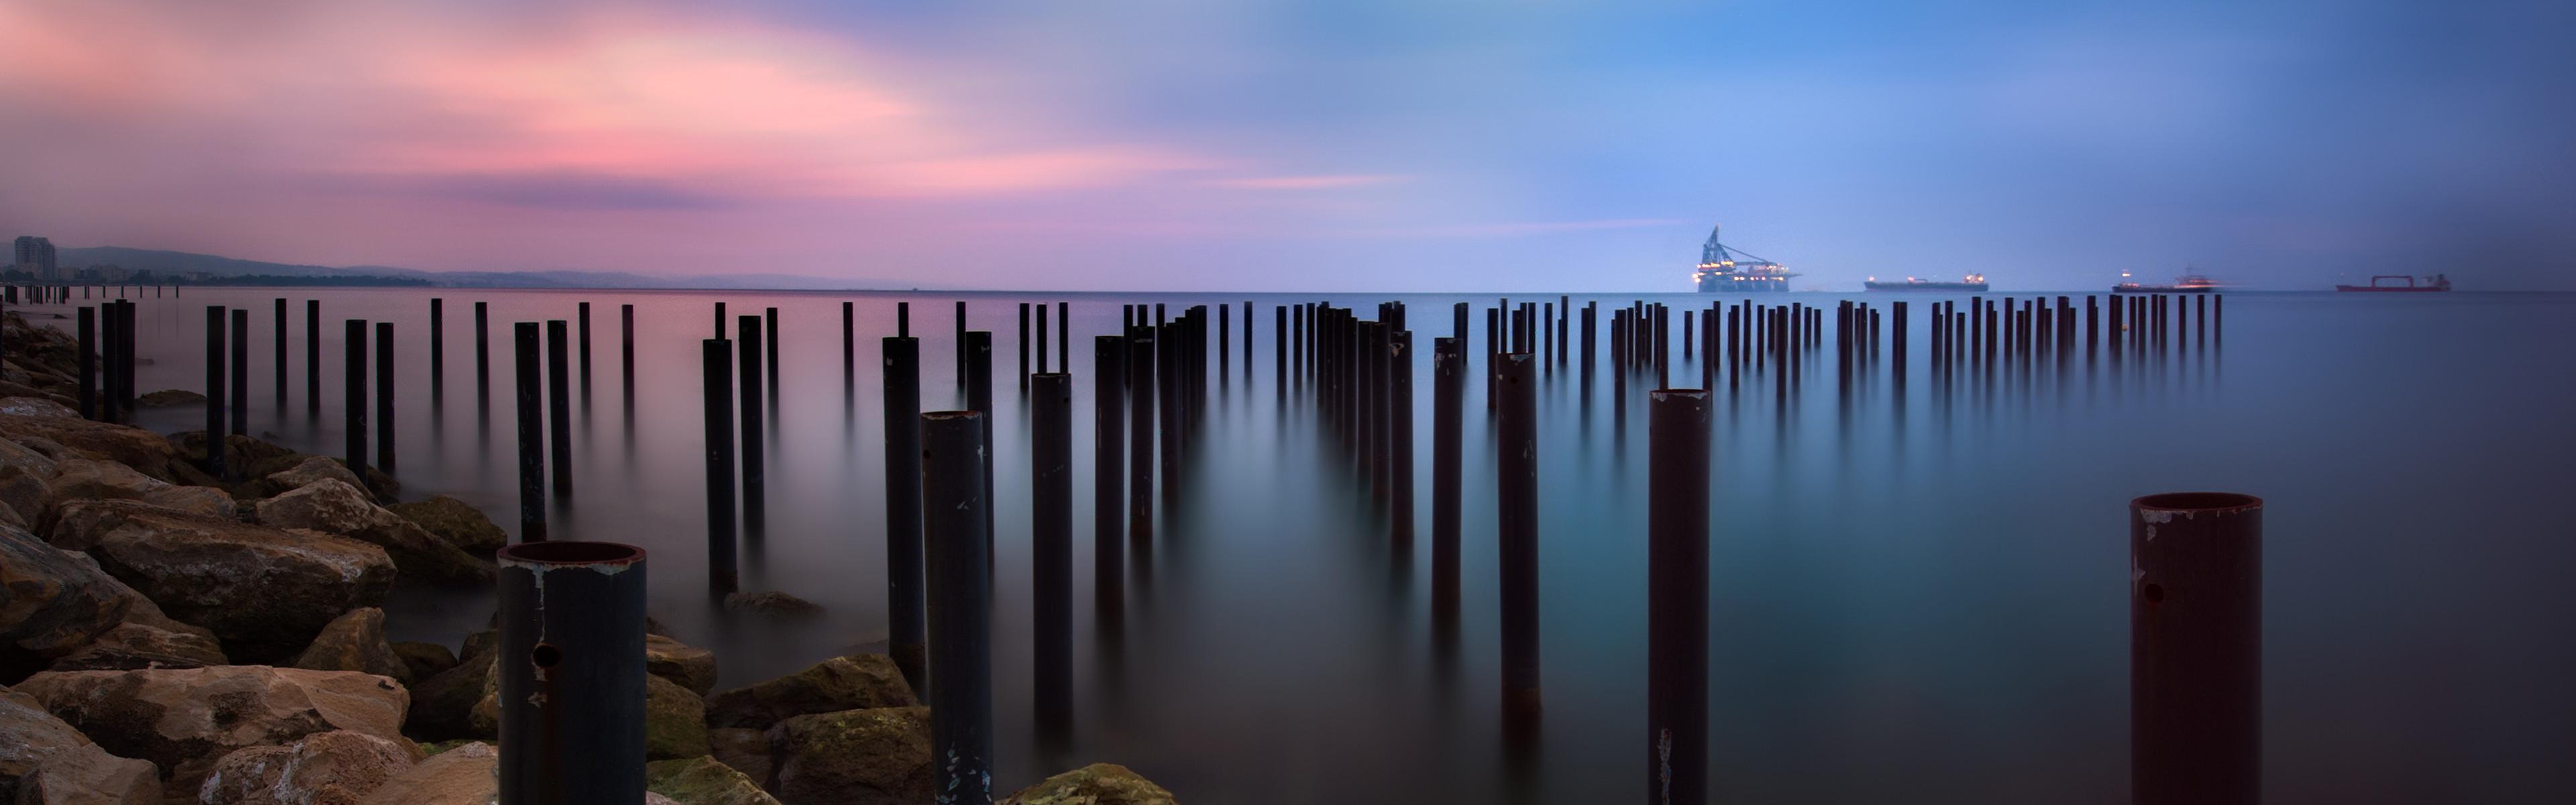 1095 2: Toward the sea iPhone Panoramic wallpaper